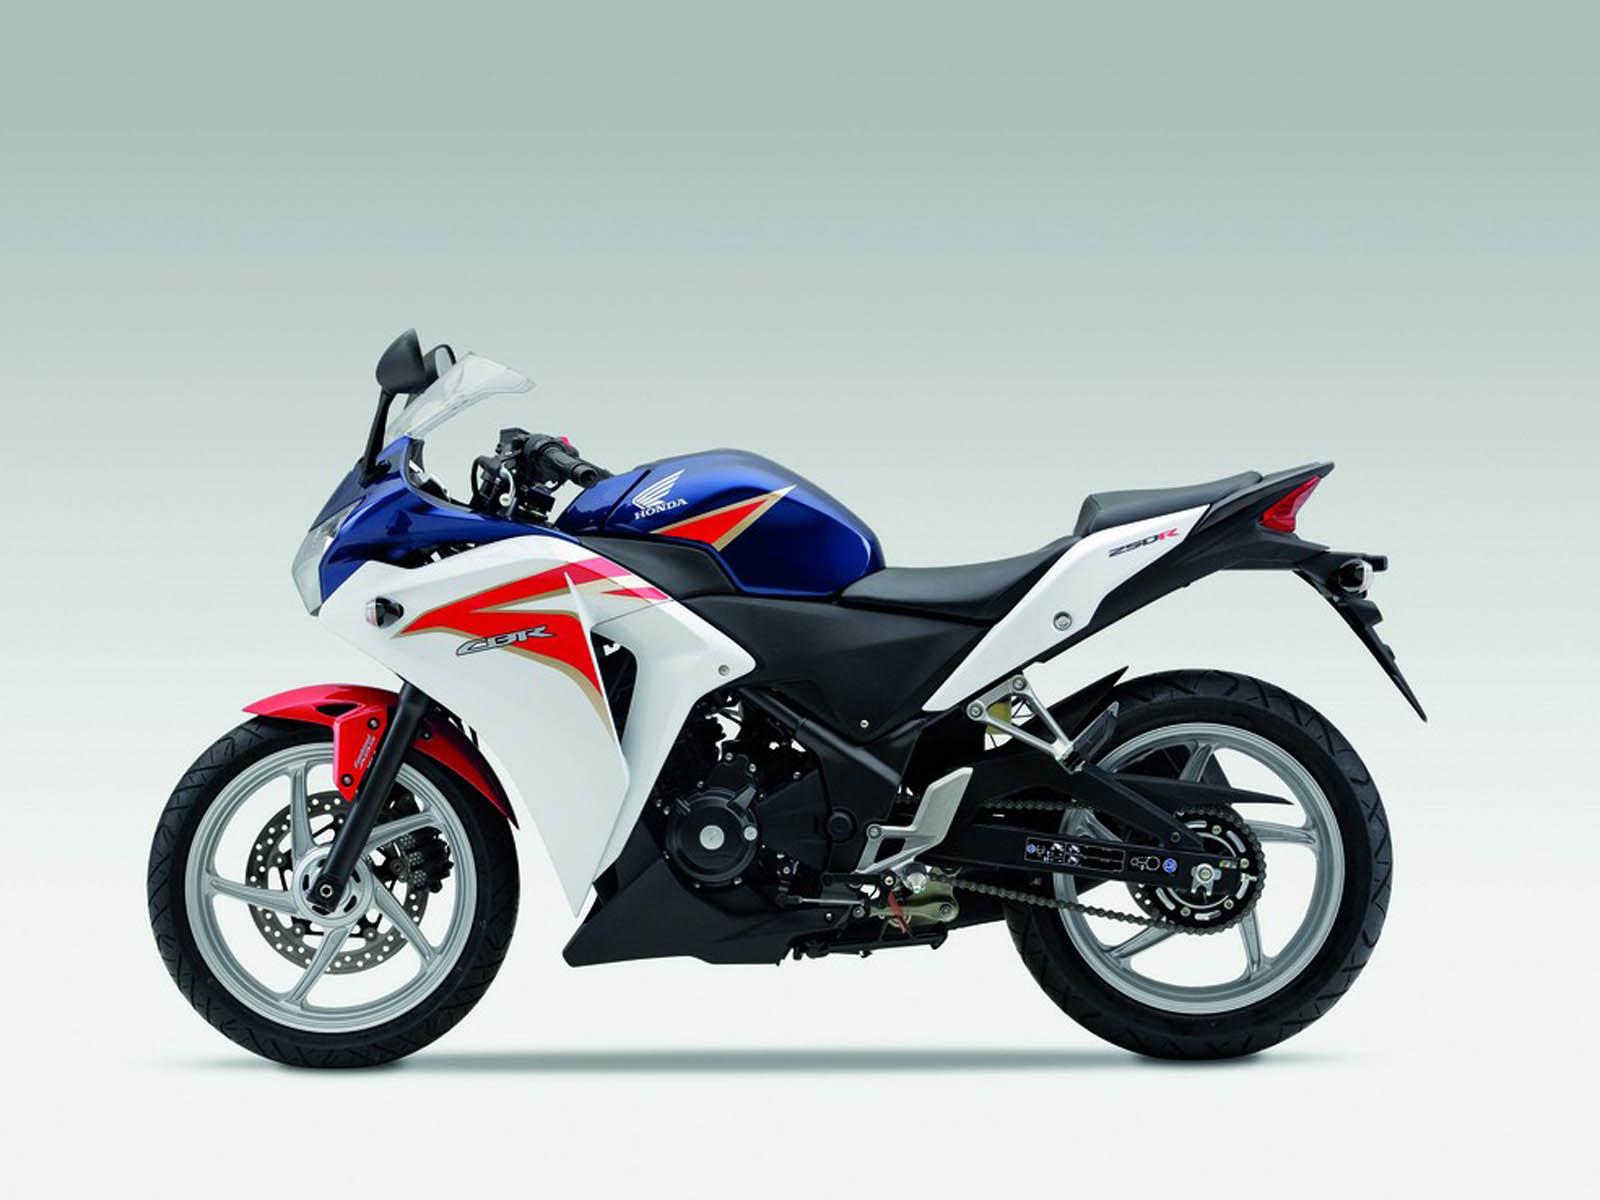 Honda Cbr Bike Images Hd